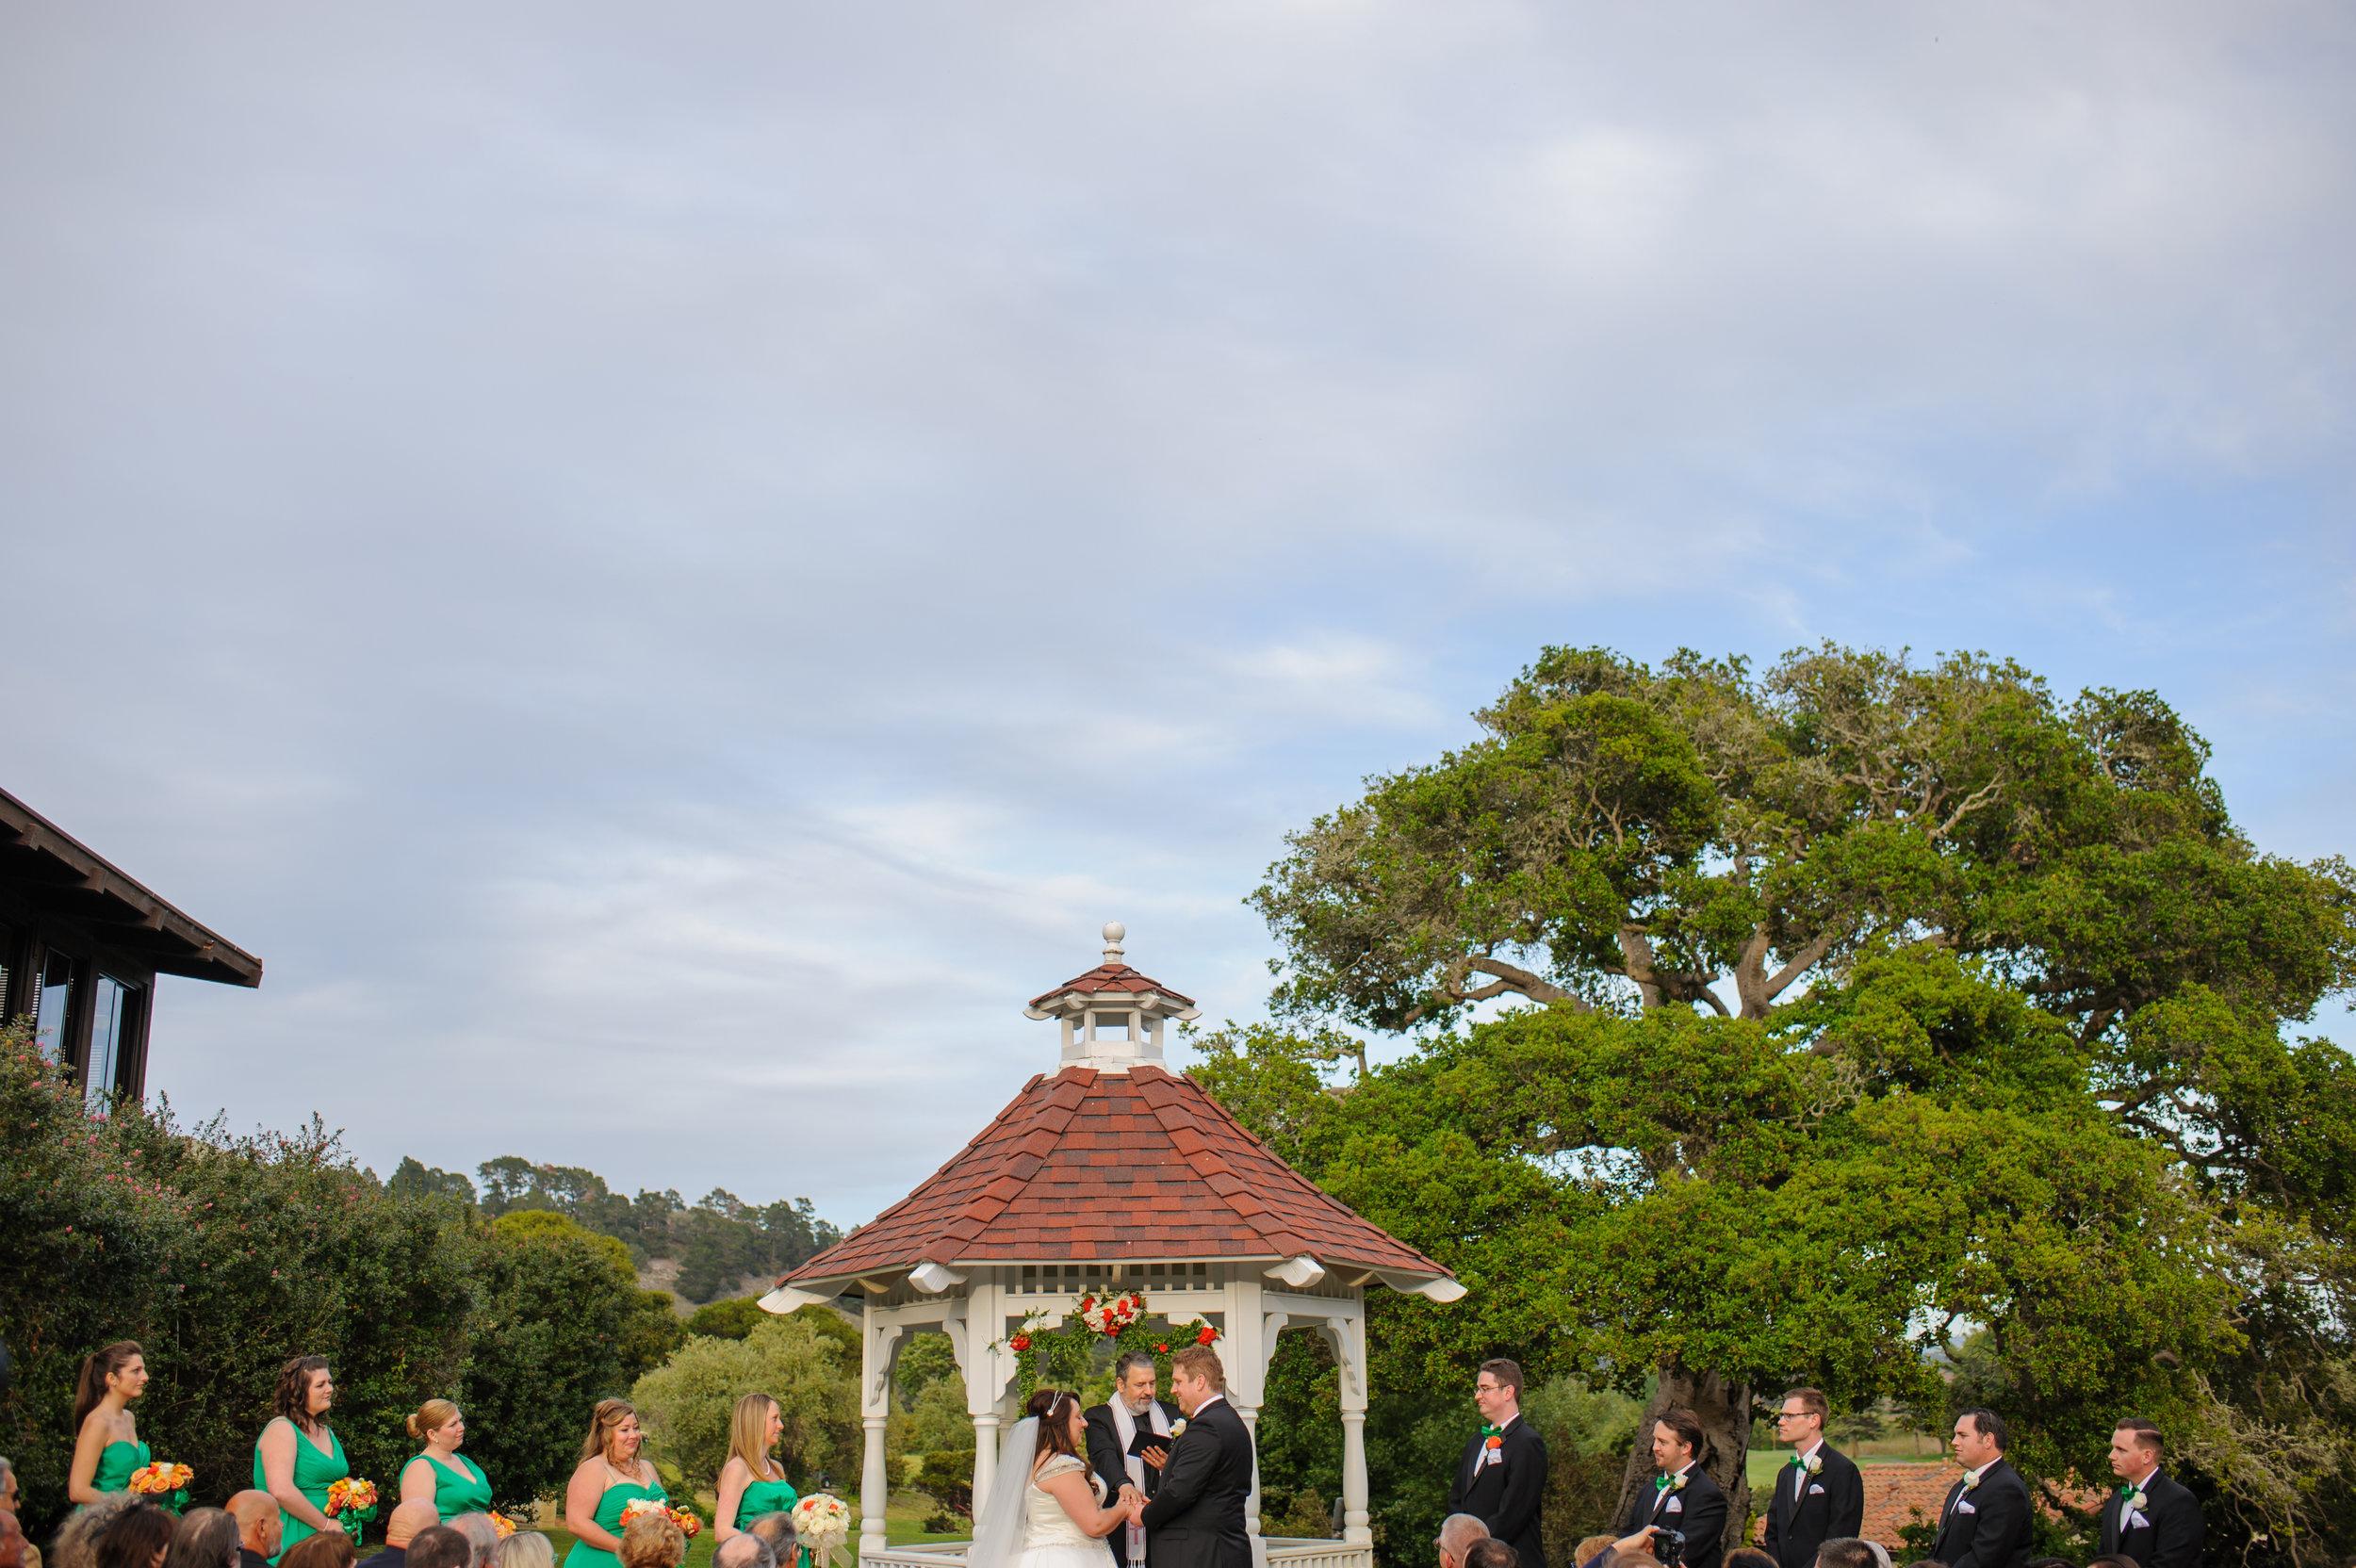 lauren-joel-001-rancho-canada-golf-course-carmel-wedding-photographer-katherine-nicole-photography015.JPG